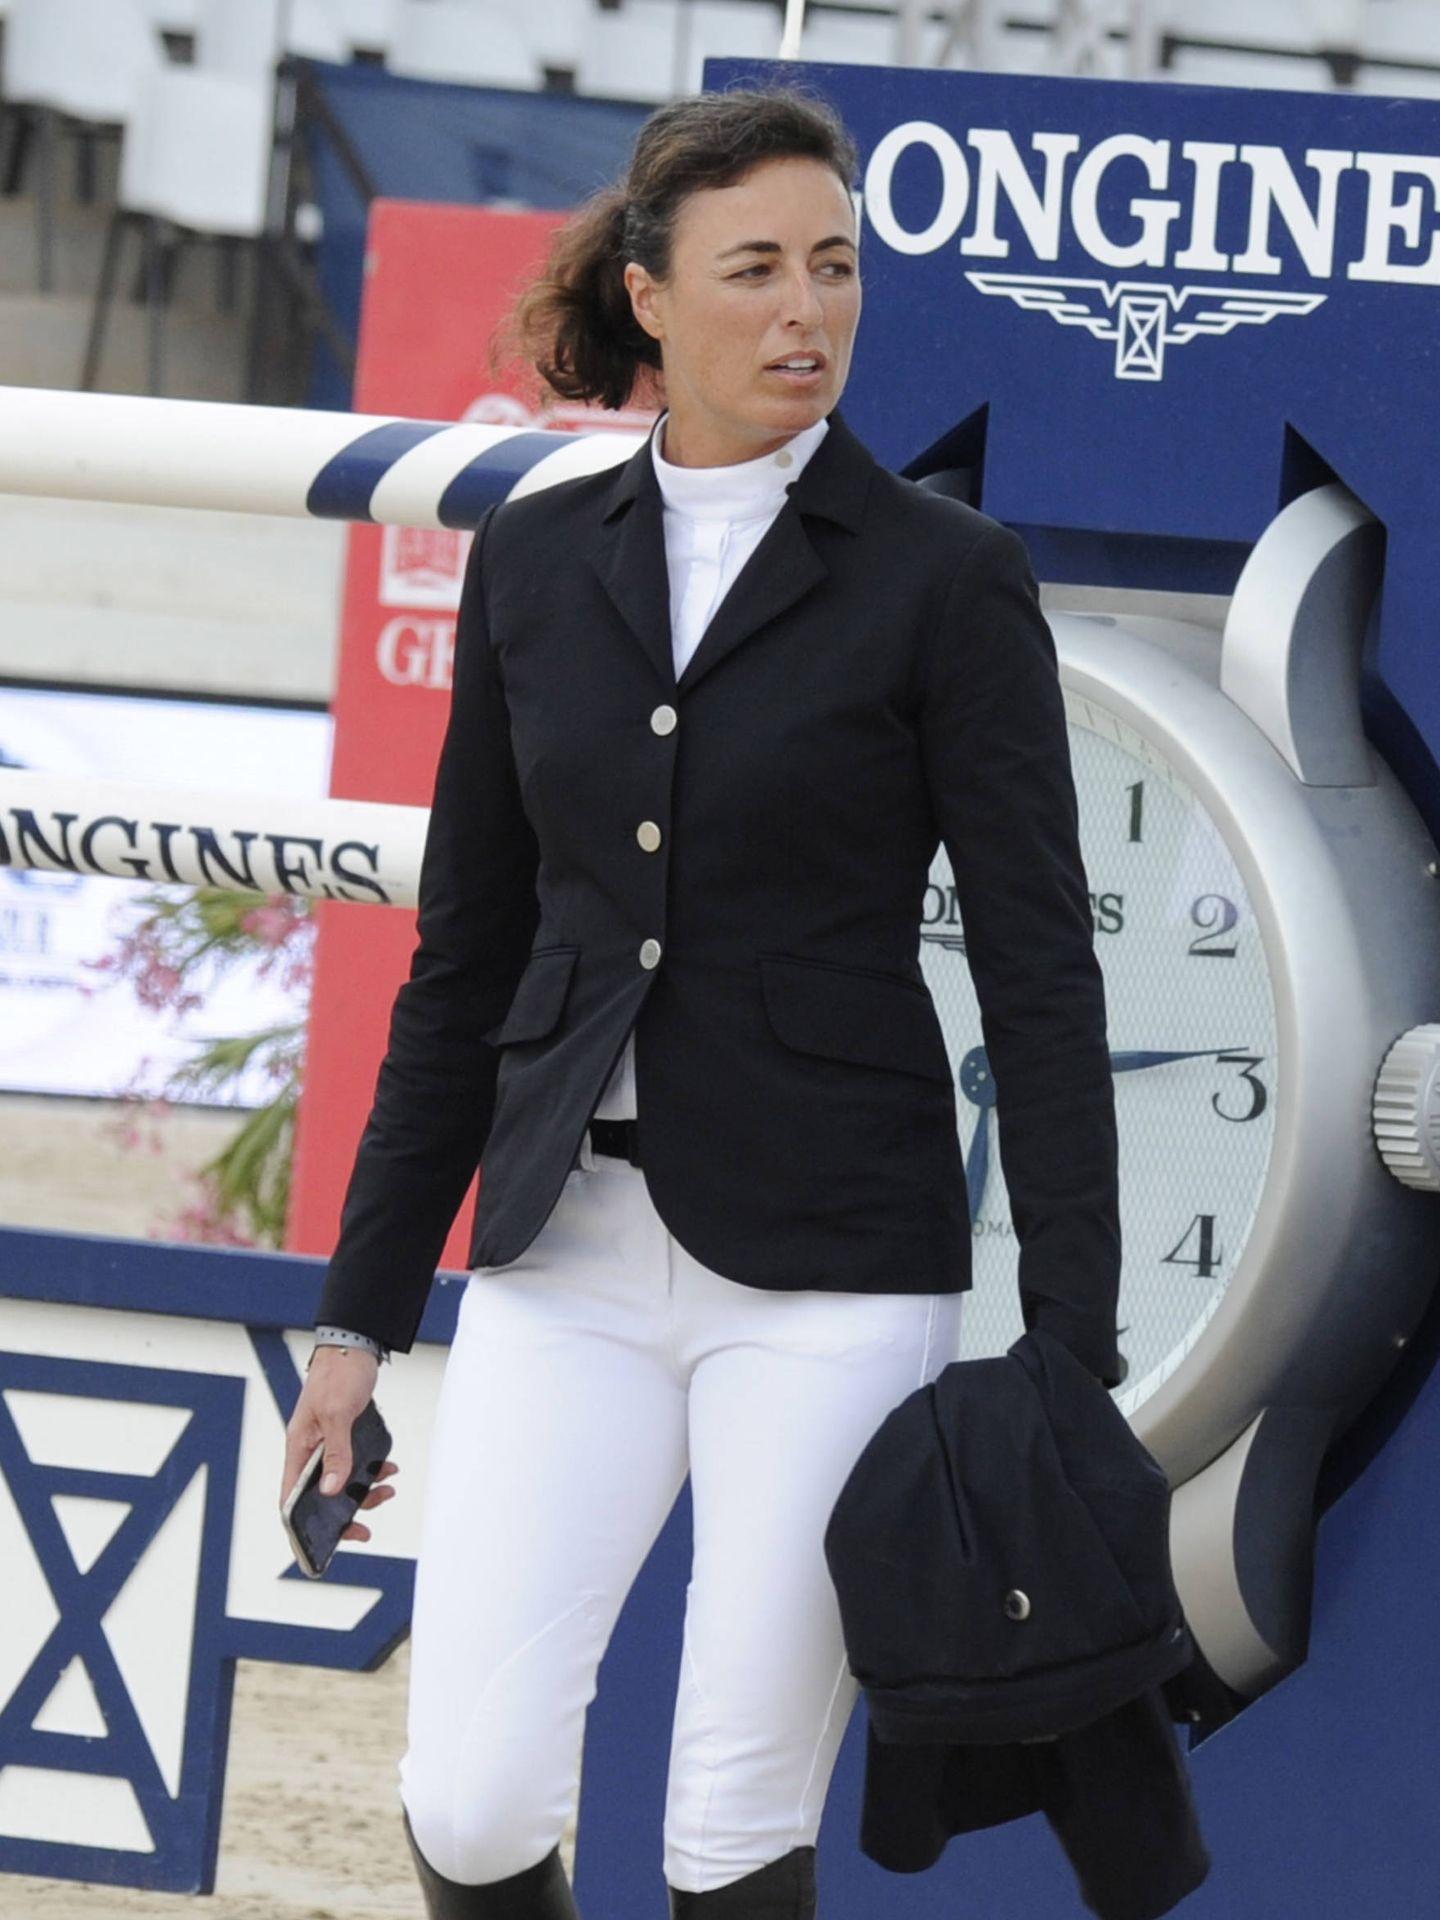 Pilar Lucrecia Cordón, en una competición hípica. (Gtres)